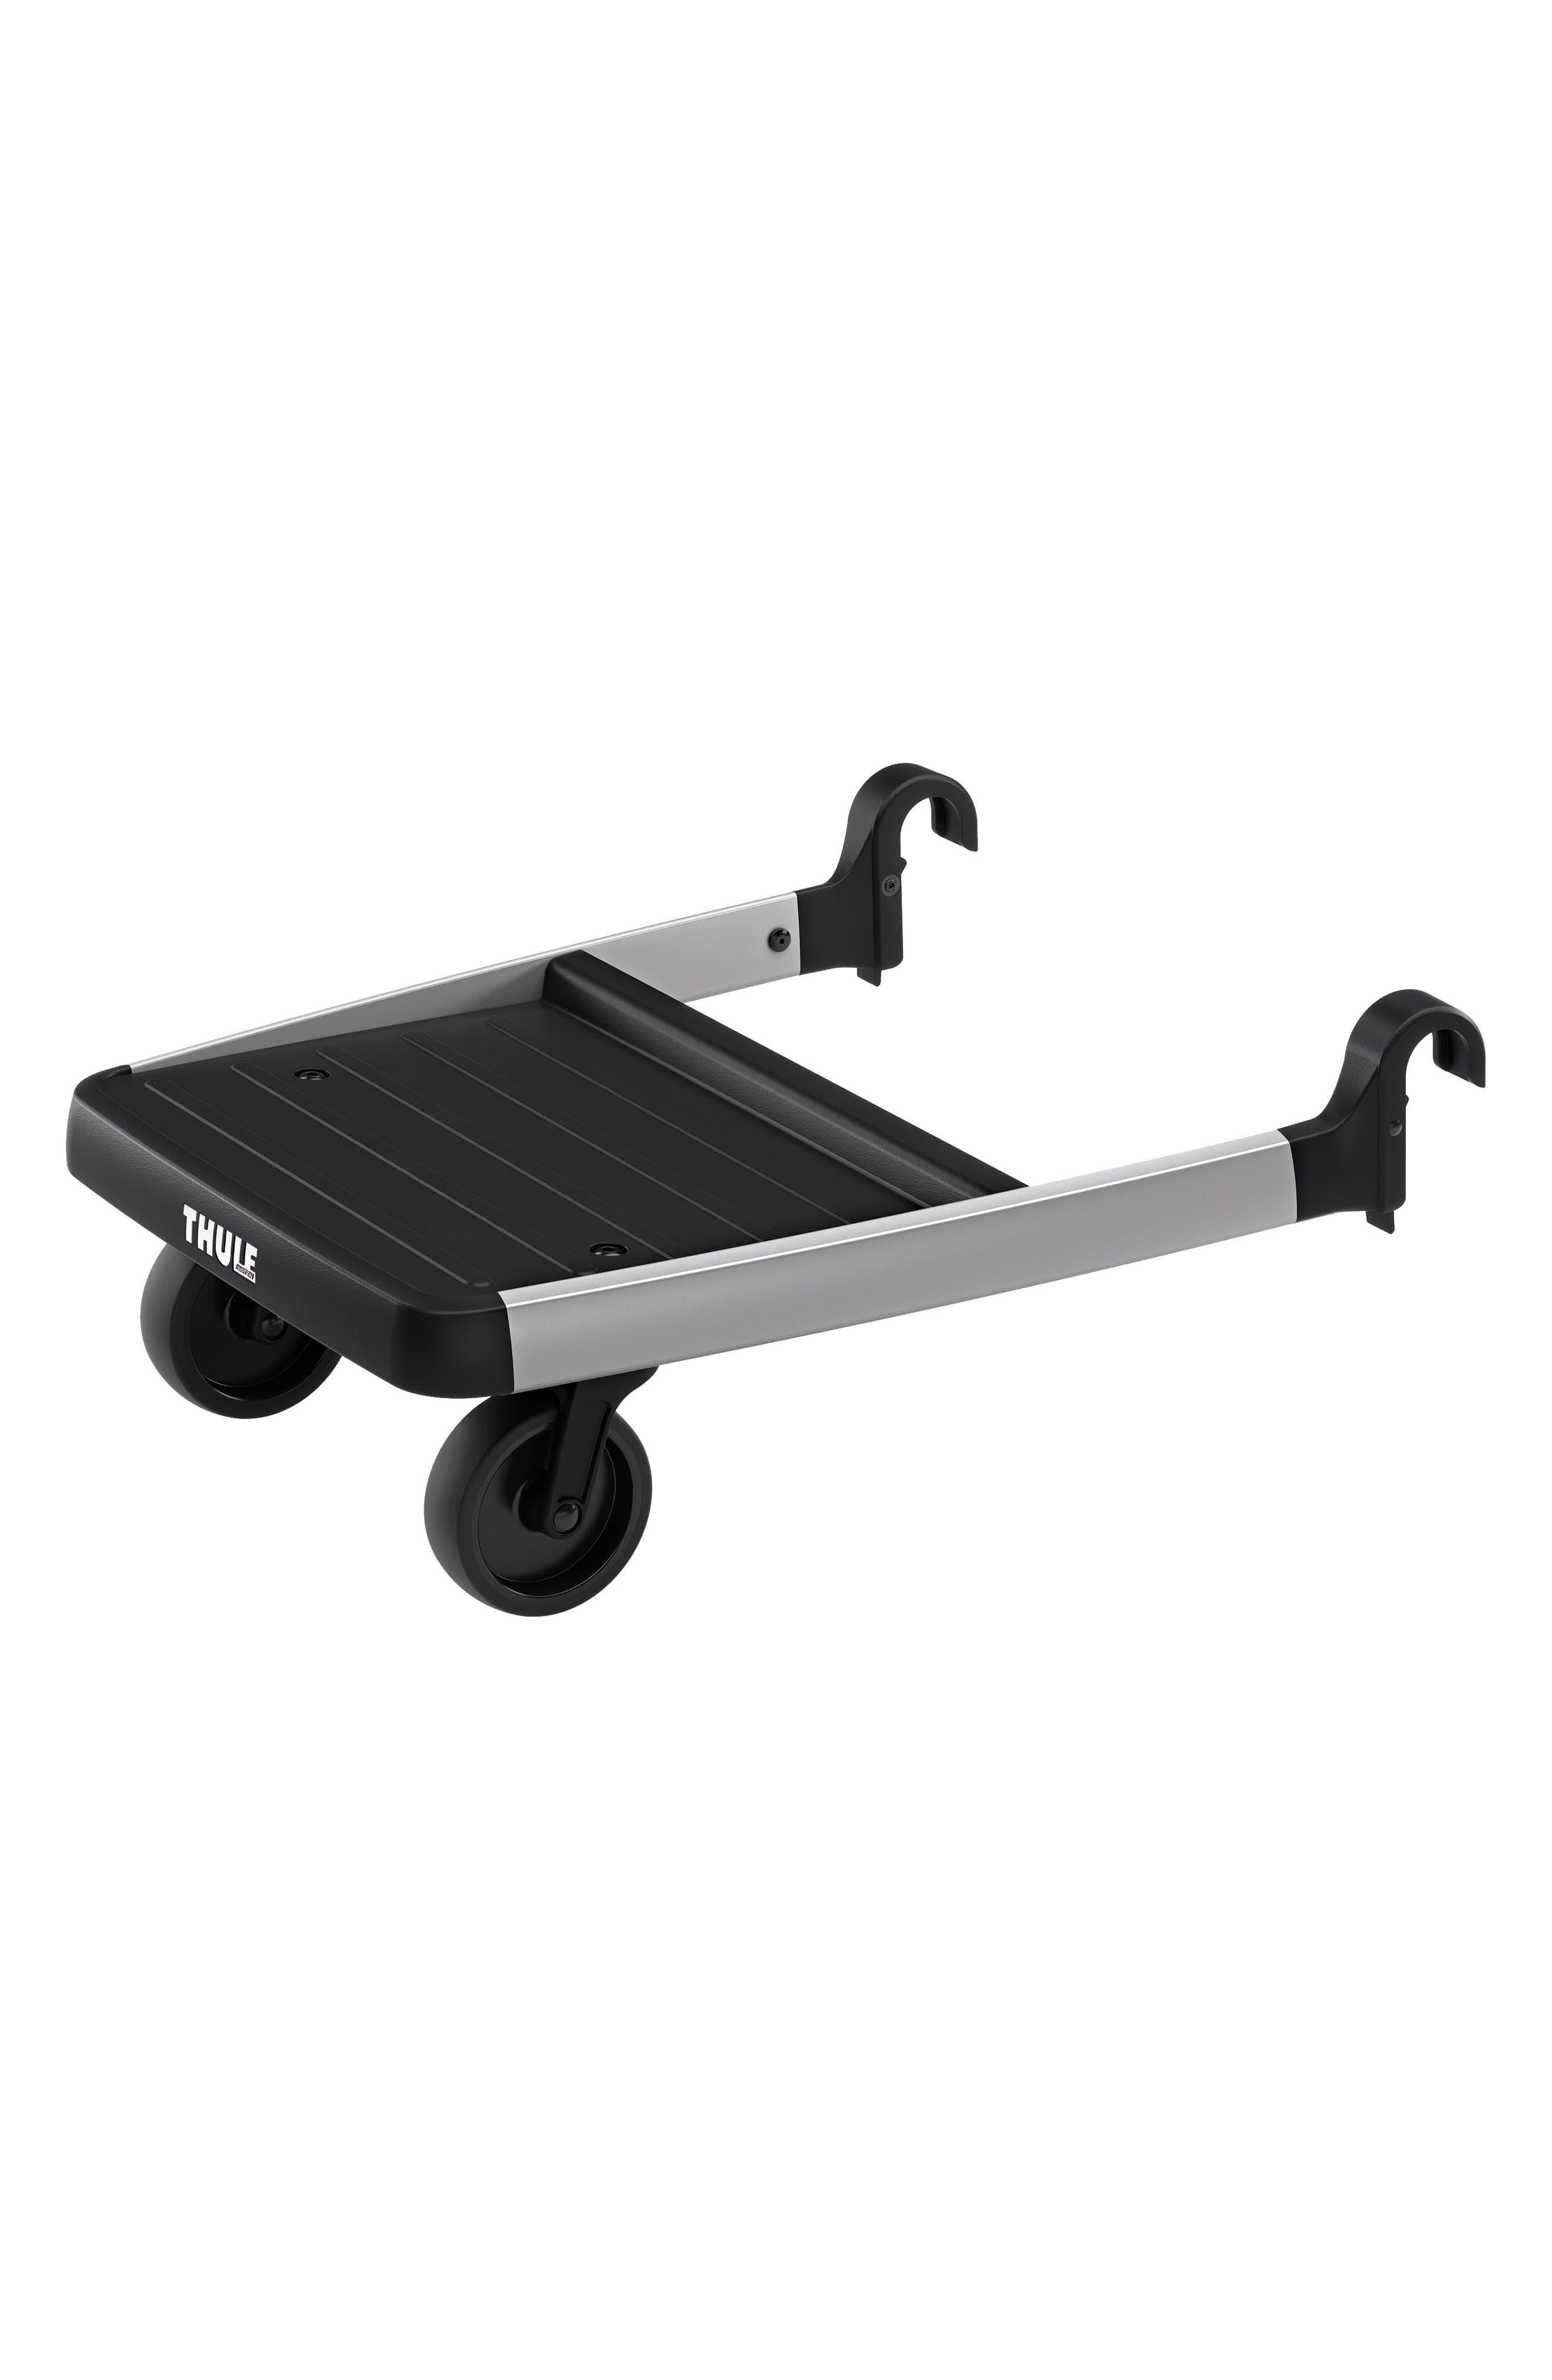 Glider Board Attachment for Thule Sleek Stroller, Main, color, BLACK/ SILVER